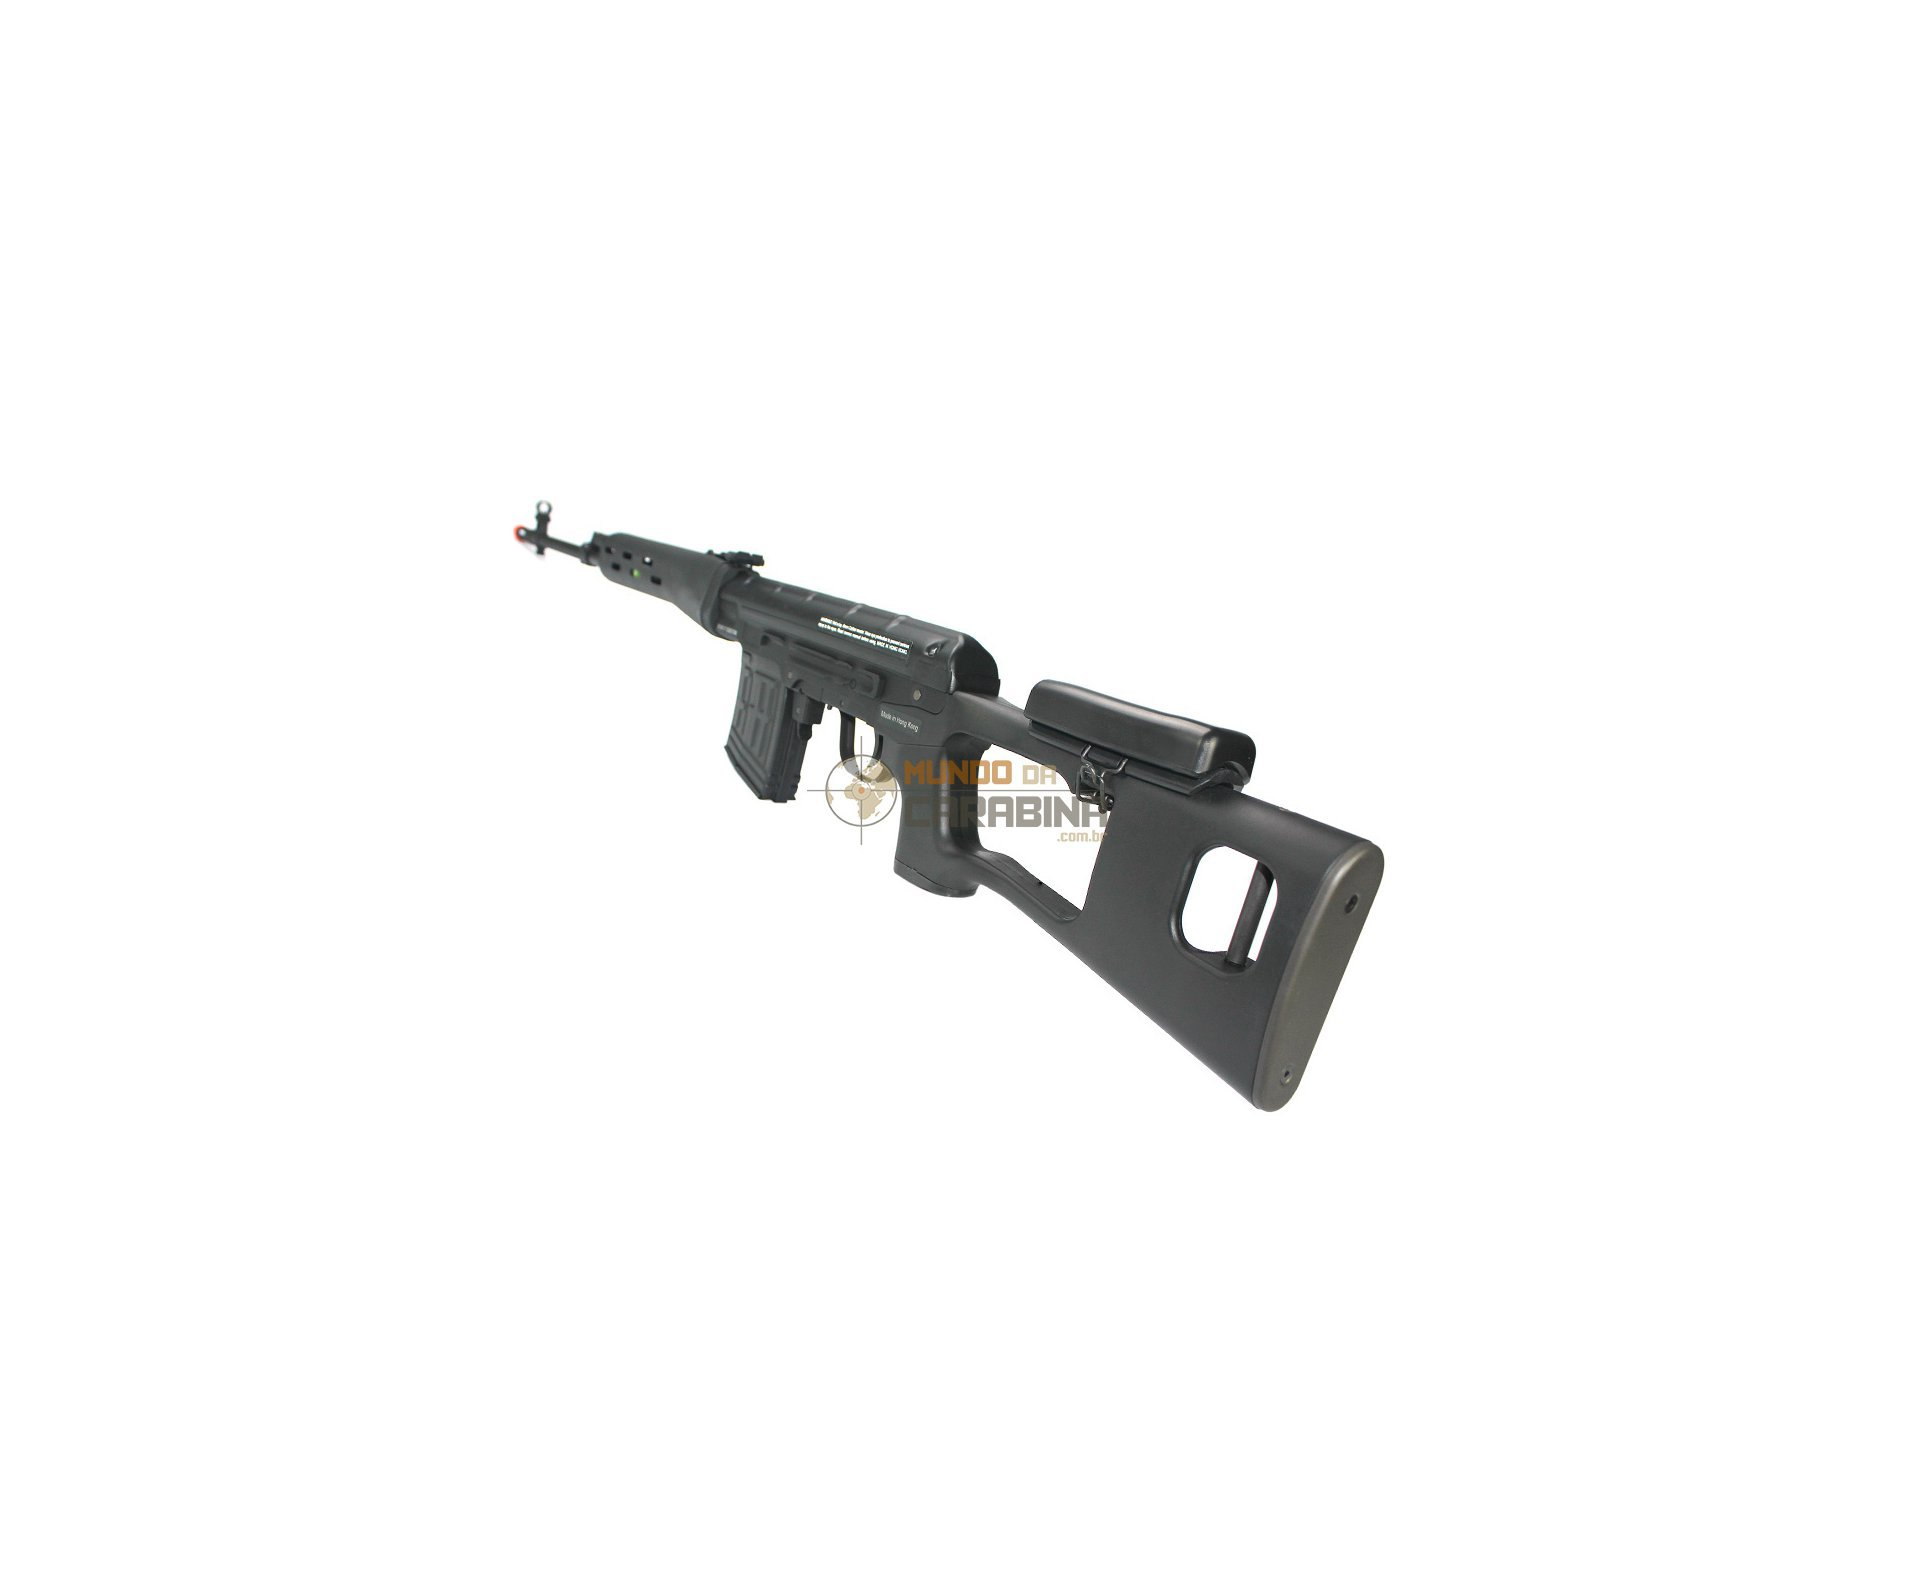 Rifle De Airsoft Kalashnikov Sniper Svd Cal 6.0mm - Bivolt - King Arms